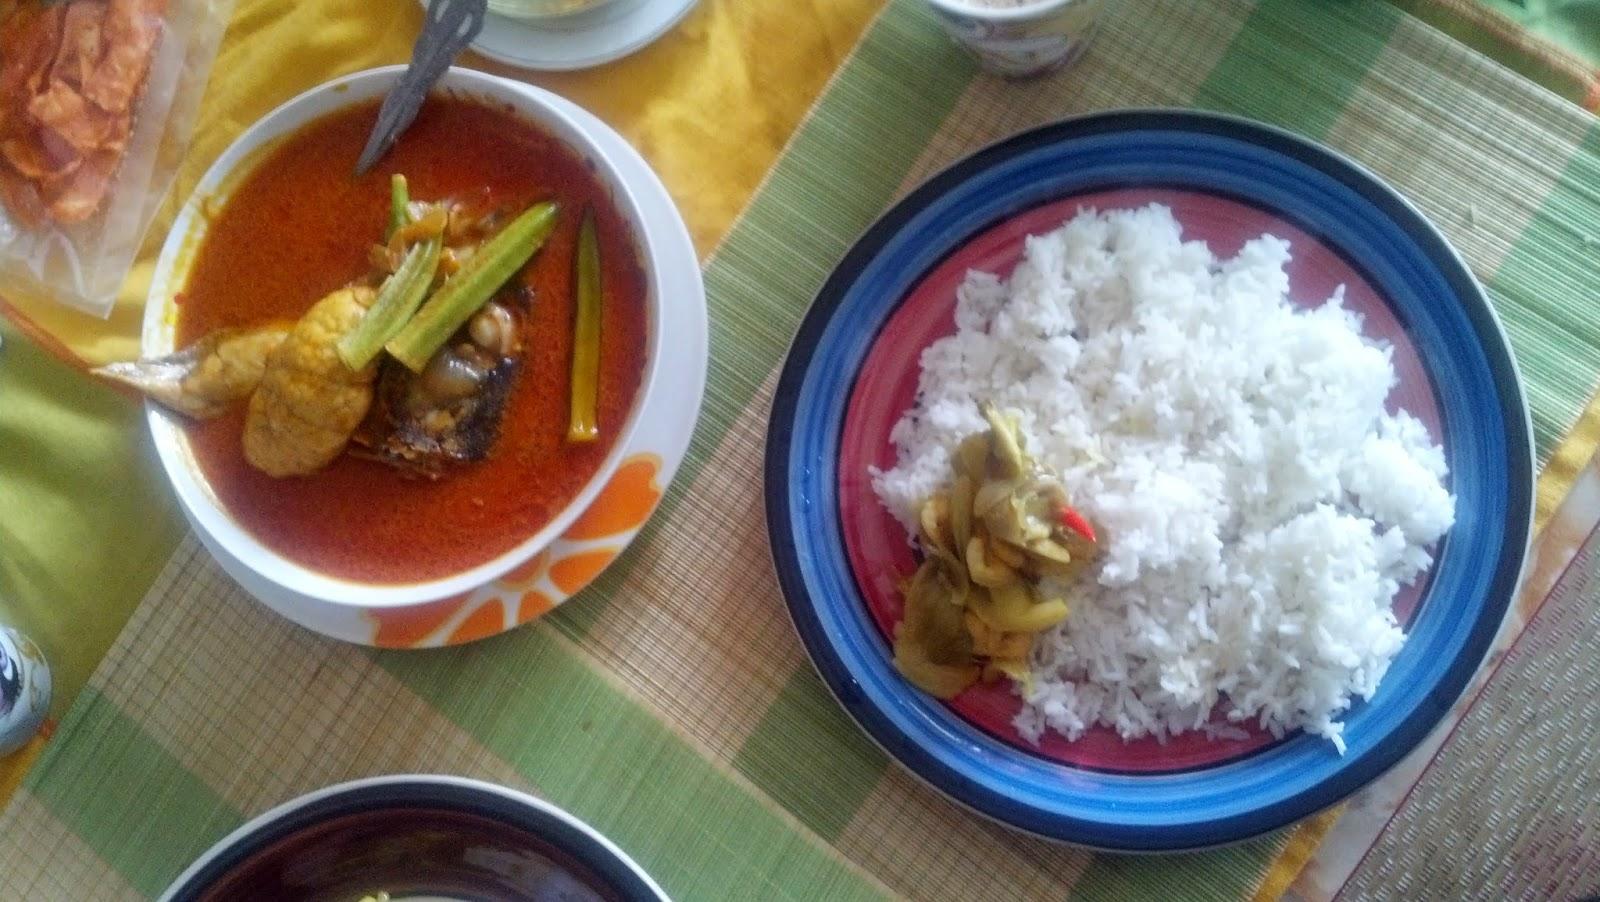 fish curry,fish_curry,nasi putih dan kari kepala ikan,nasi kandar line clear,nasi kandar kapitan,kapitan curry,nasi_kandar_beratur,resepi-kari_kepala_ikan